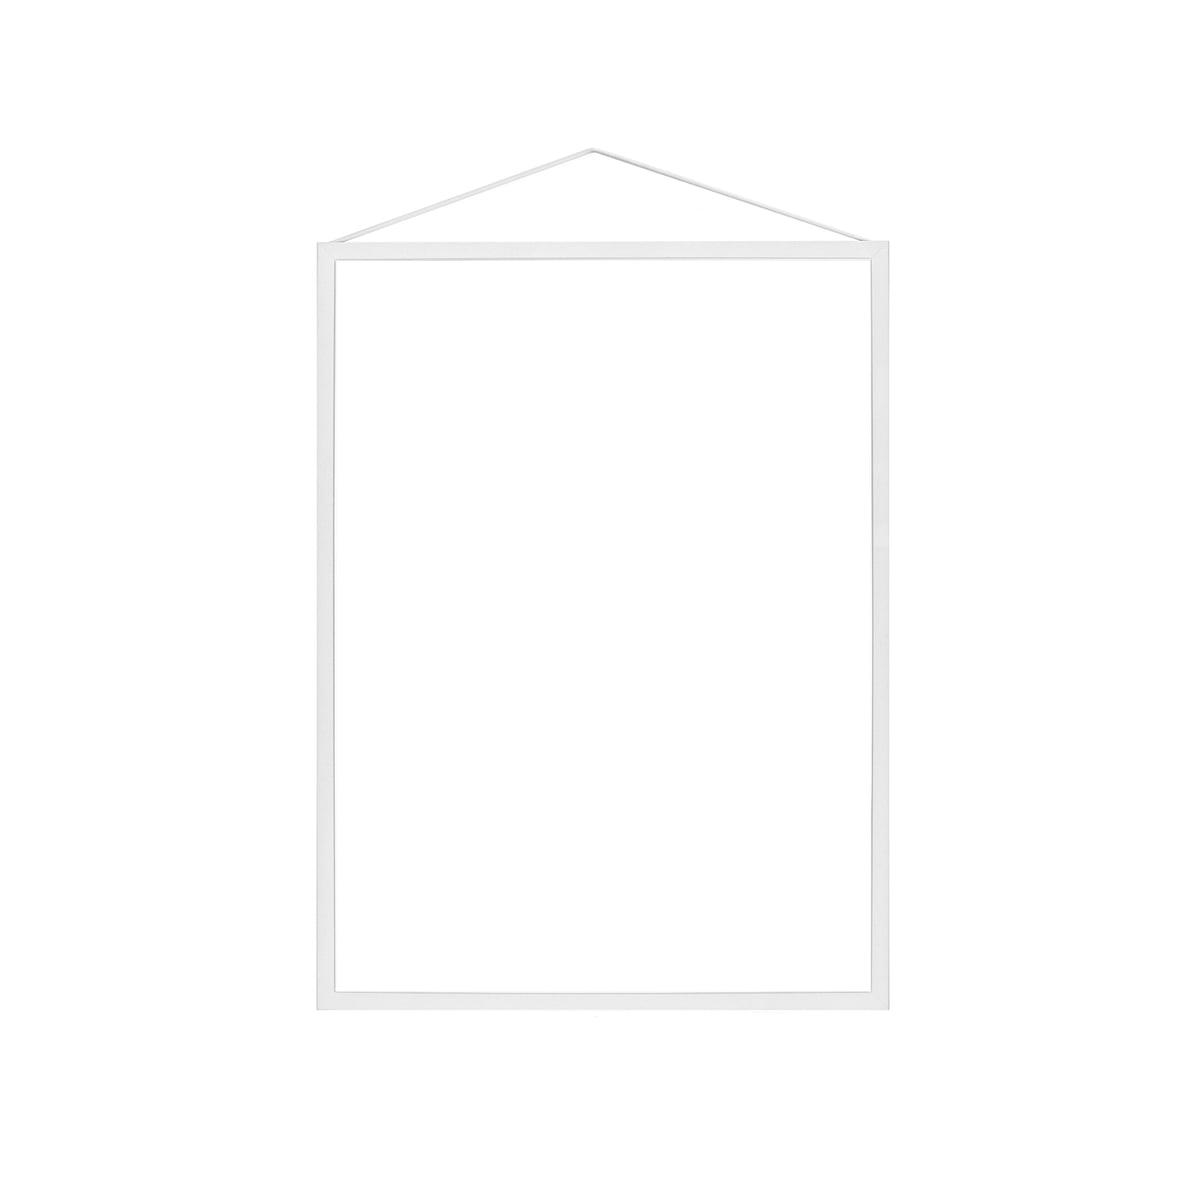 Moebe - Frame Bilderrahmen A3, weiß   Dekoration > Bilder und Rahmen > Rahmen   Weiß   Moebe